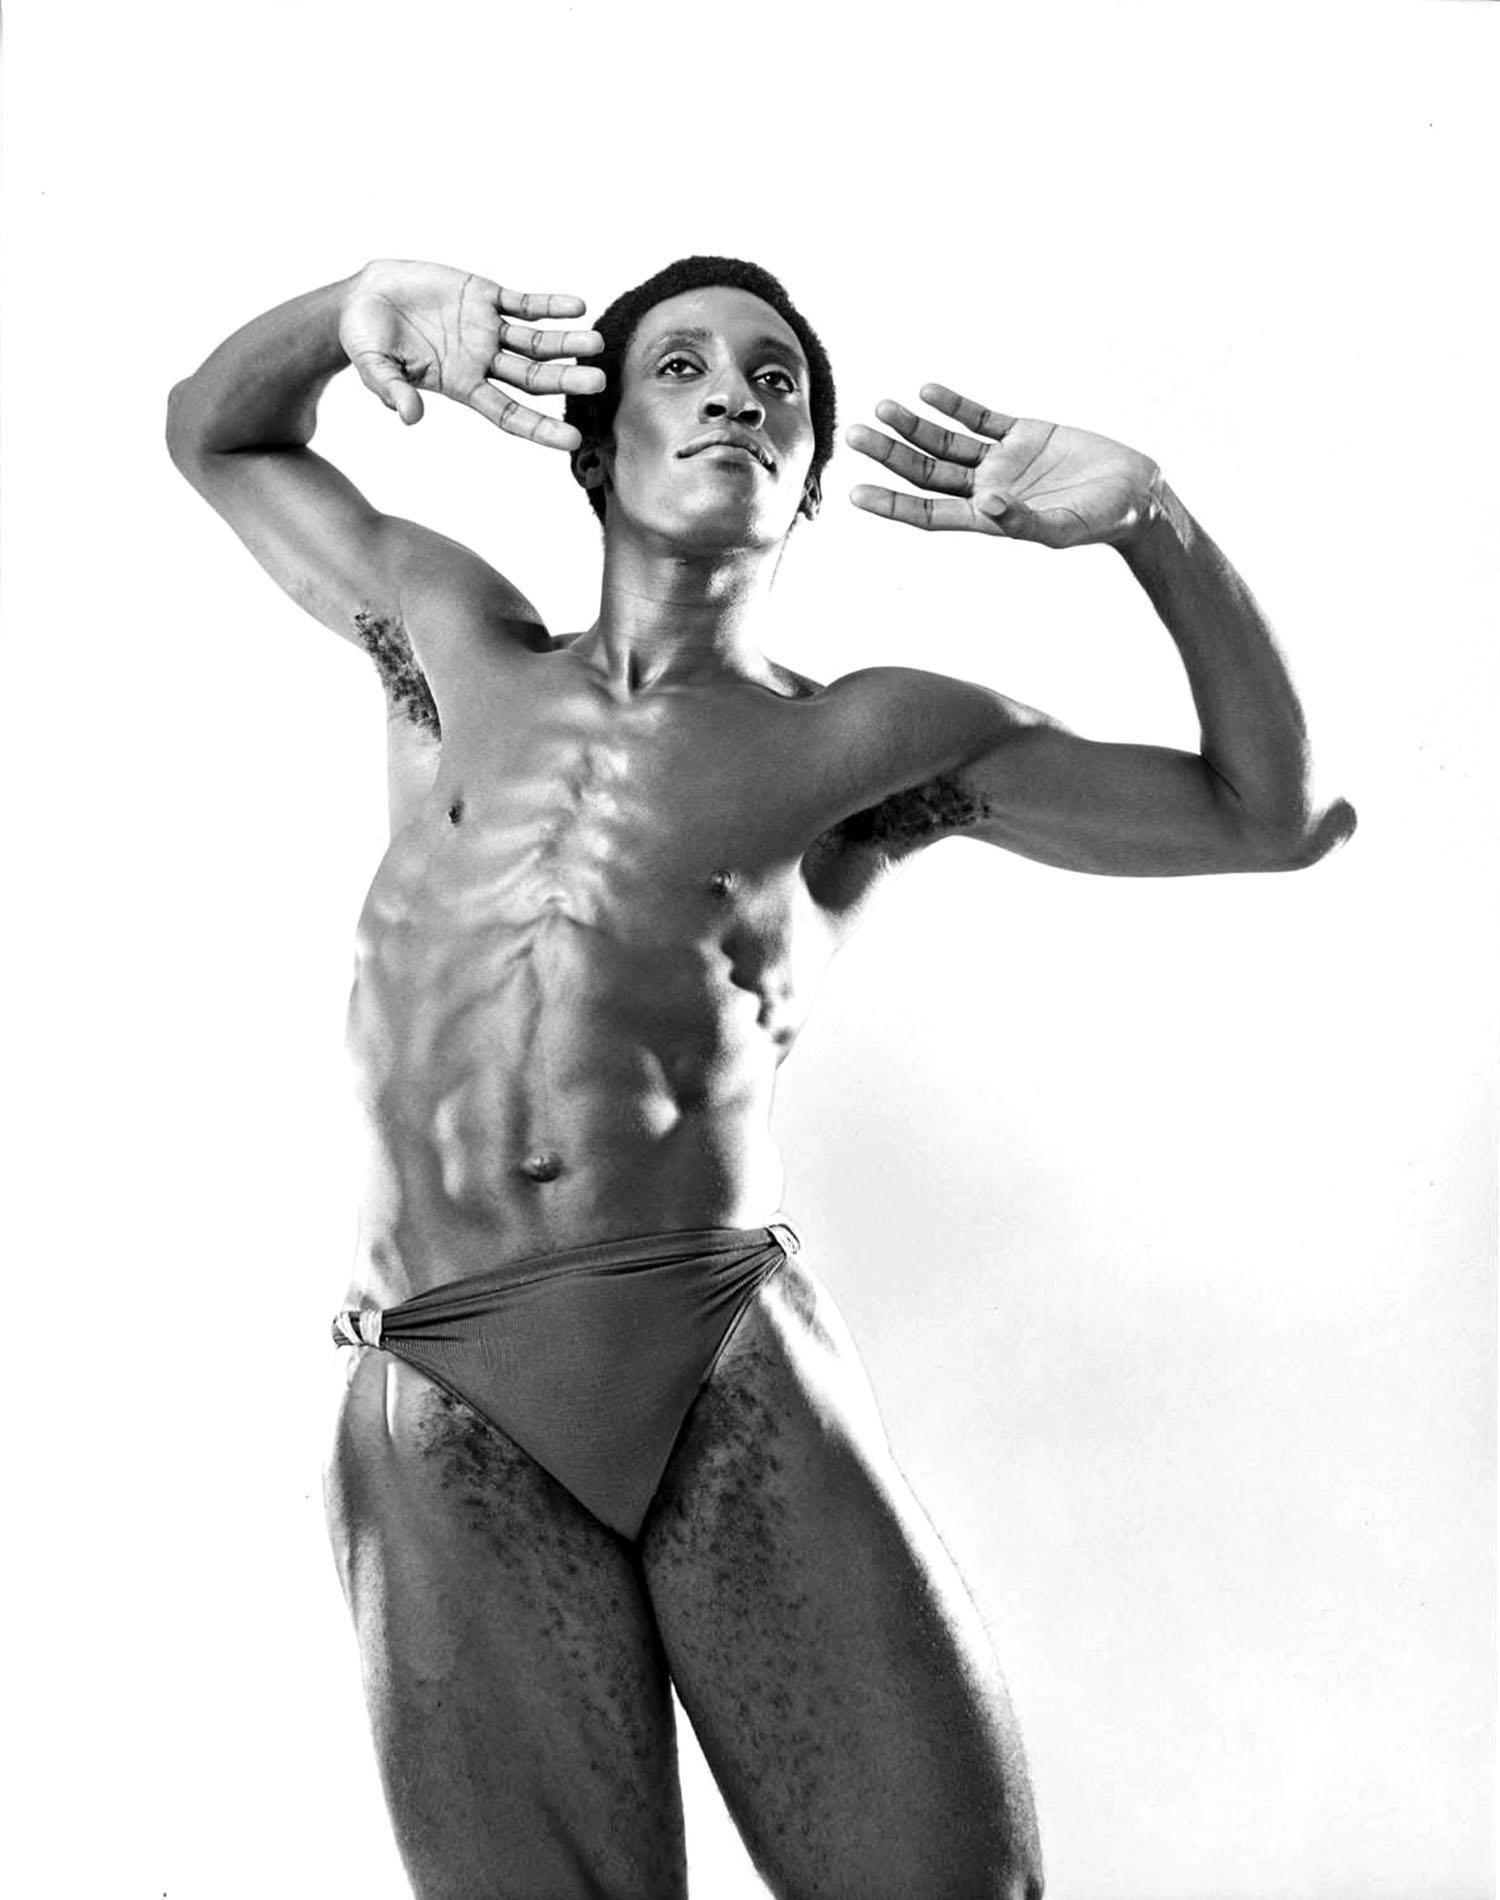 Jack Mitchell - Dance Theatre of Harlem dancer Ronald Darden For Sale at 1stDibs